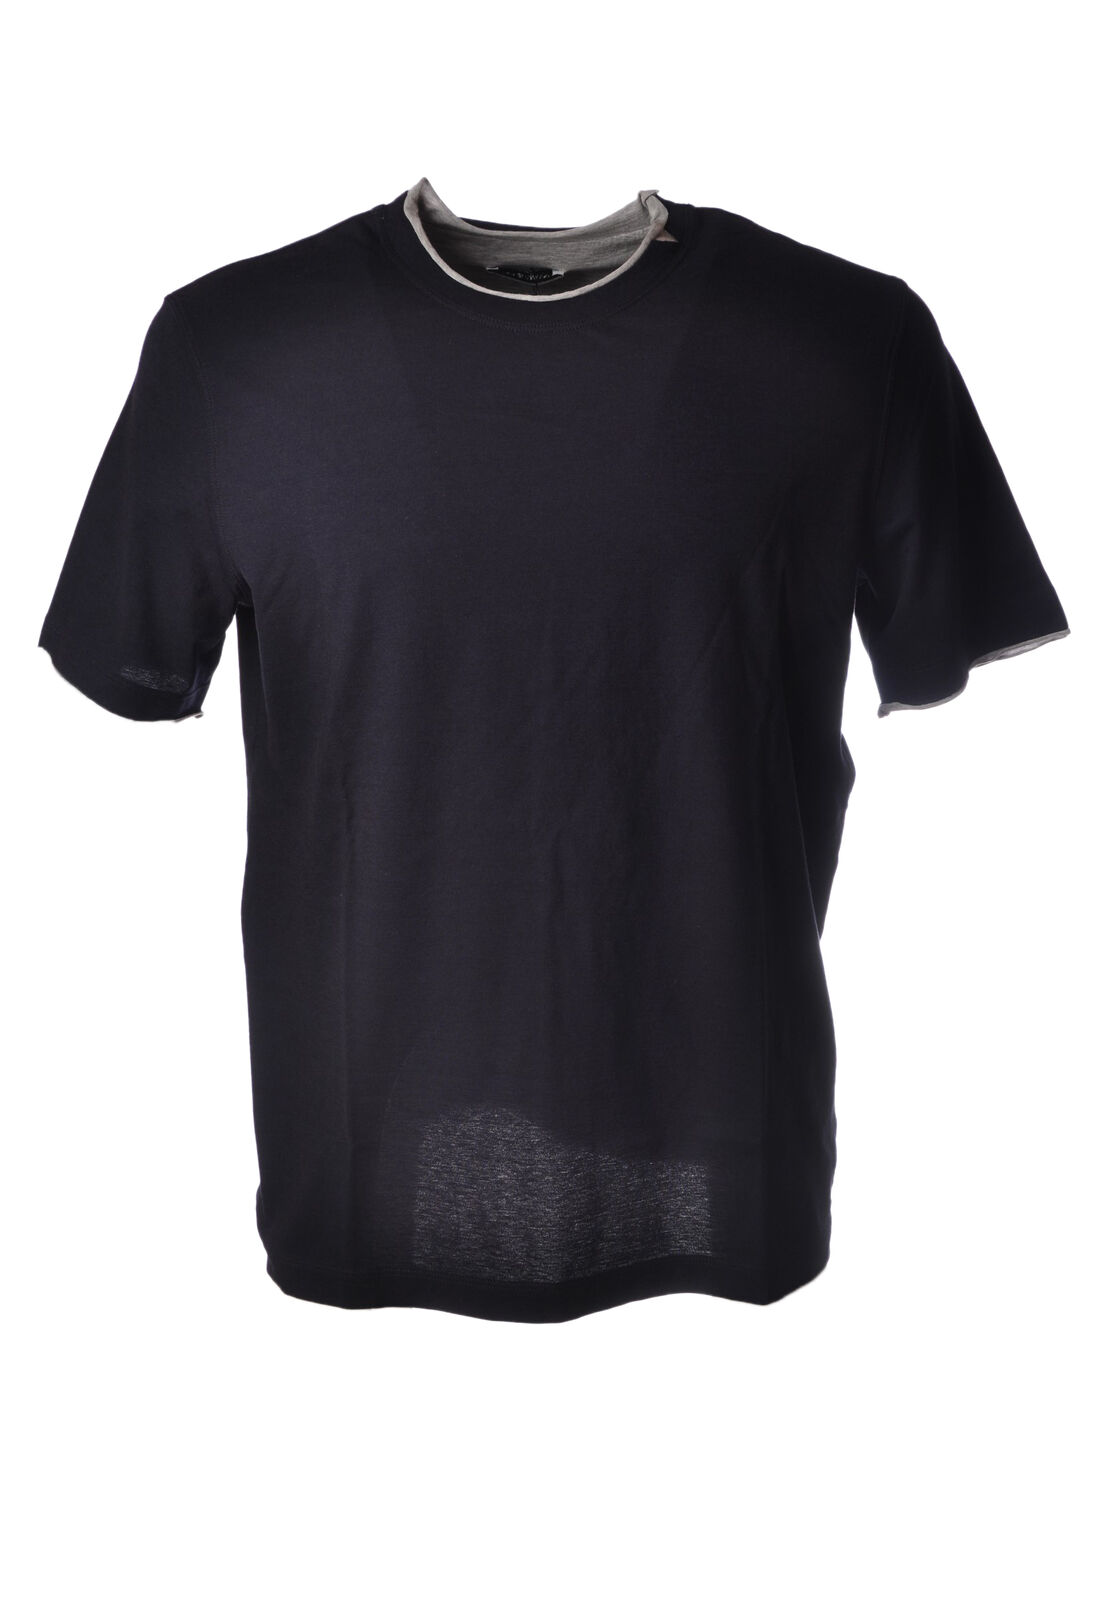 Paolo Pecora - Topwear-T-shirts - Man - Blau - 5038426E183635